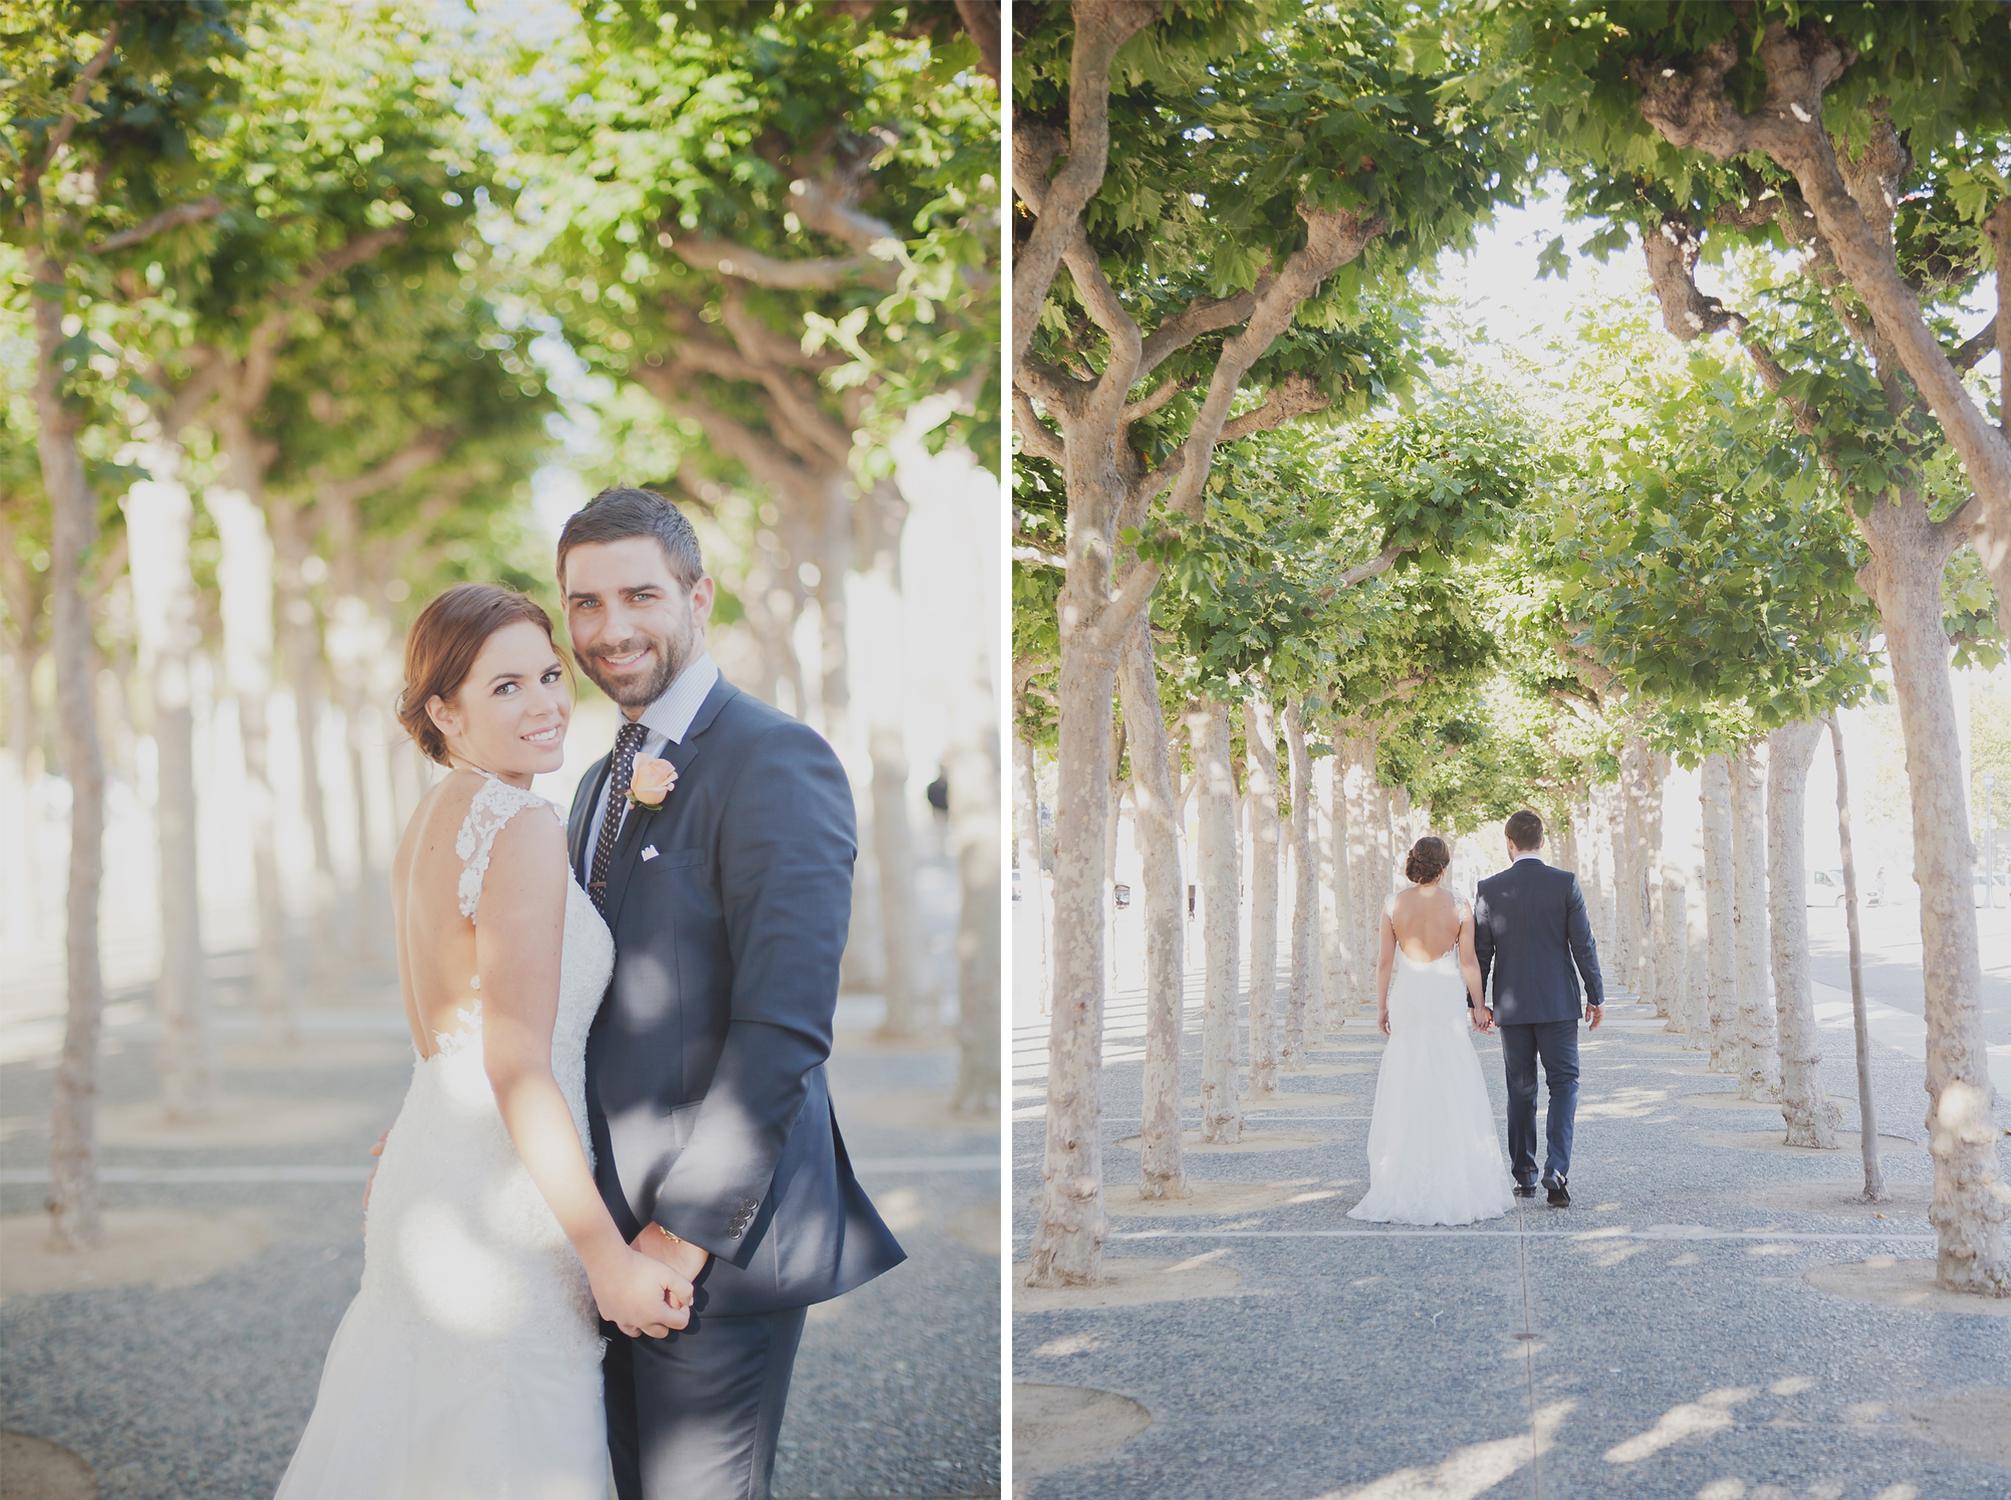 wellington wedding photography NZ - 0275.JPG